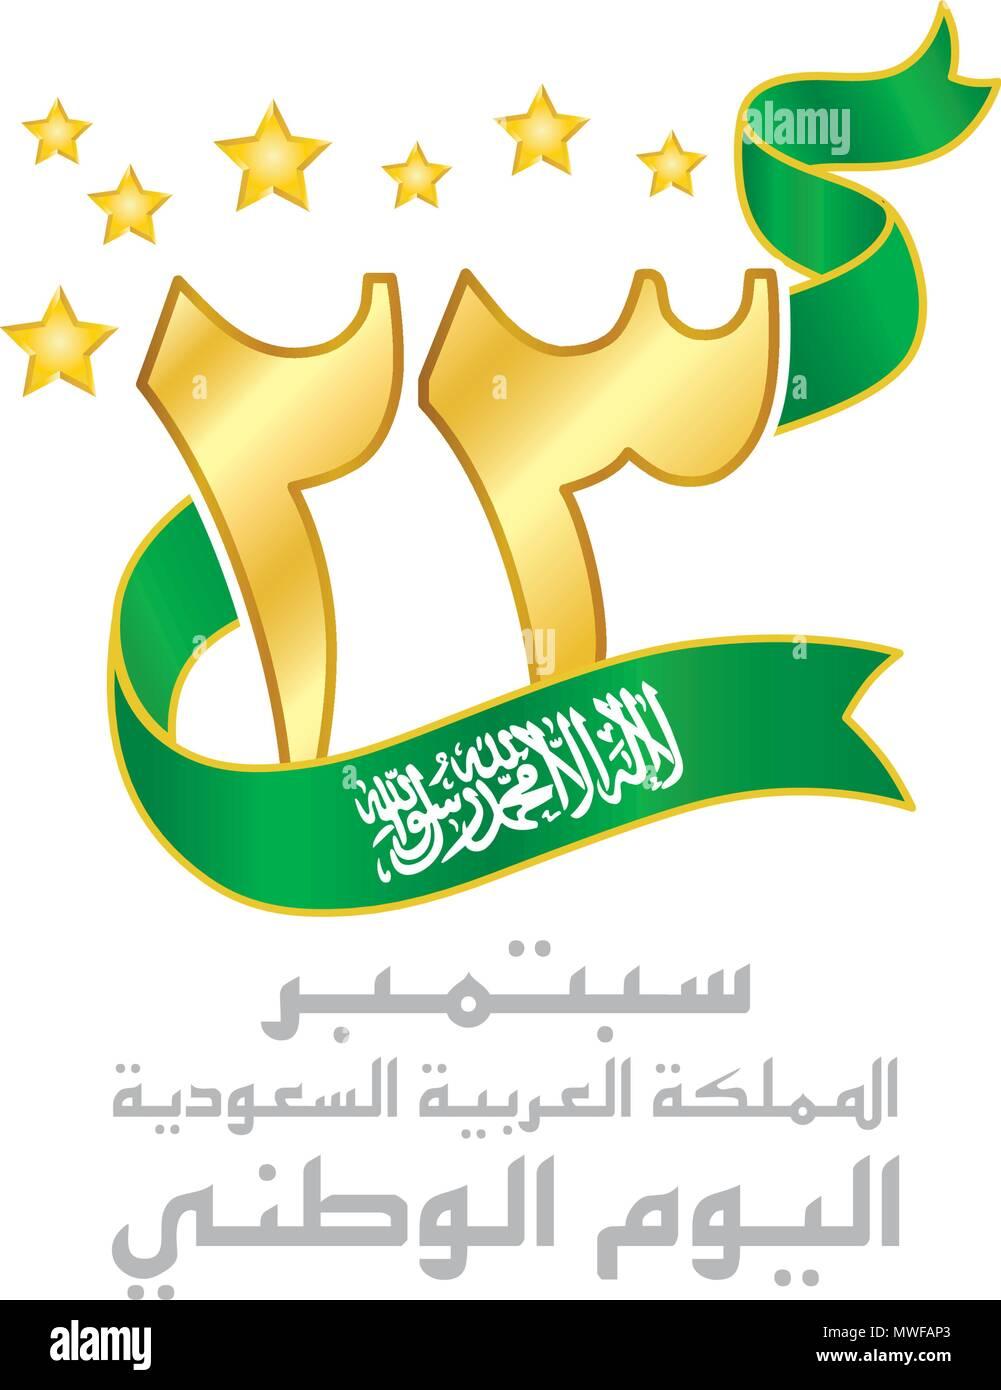 Saudi Arabia National Day Logo, Typographic emblems & badge, An inscription in Arabic '23rd September Kingdom of Saudi Arabia, National Day', Green Ri - Stock Vector